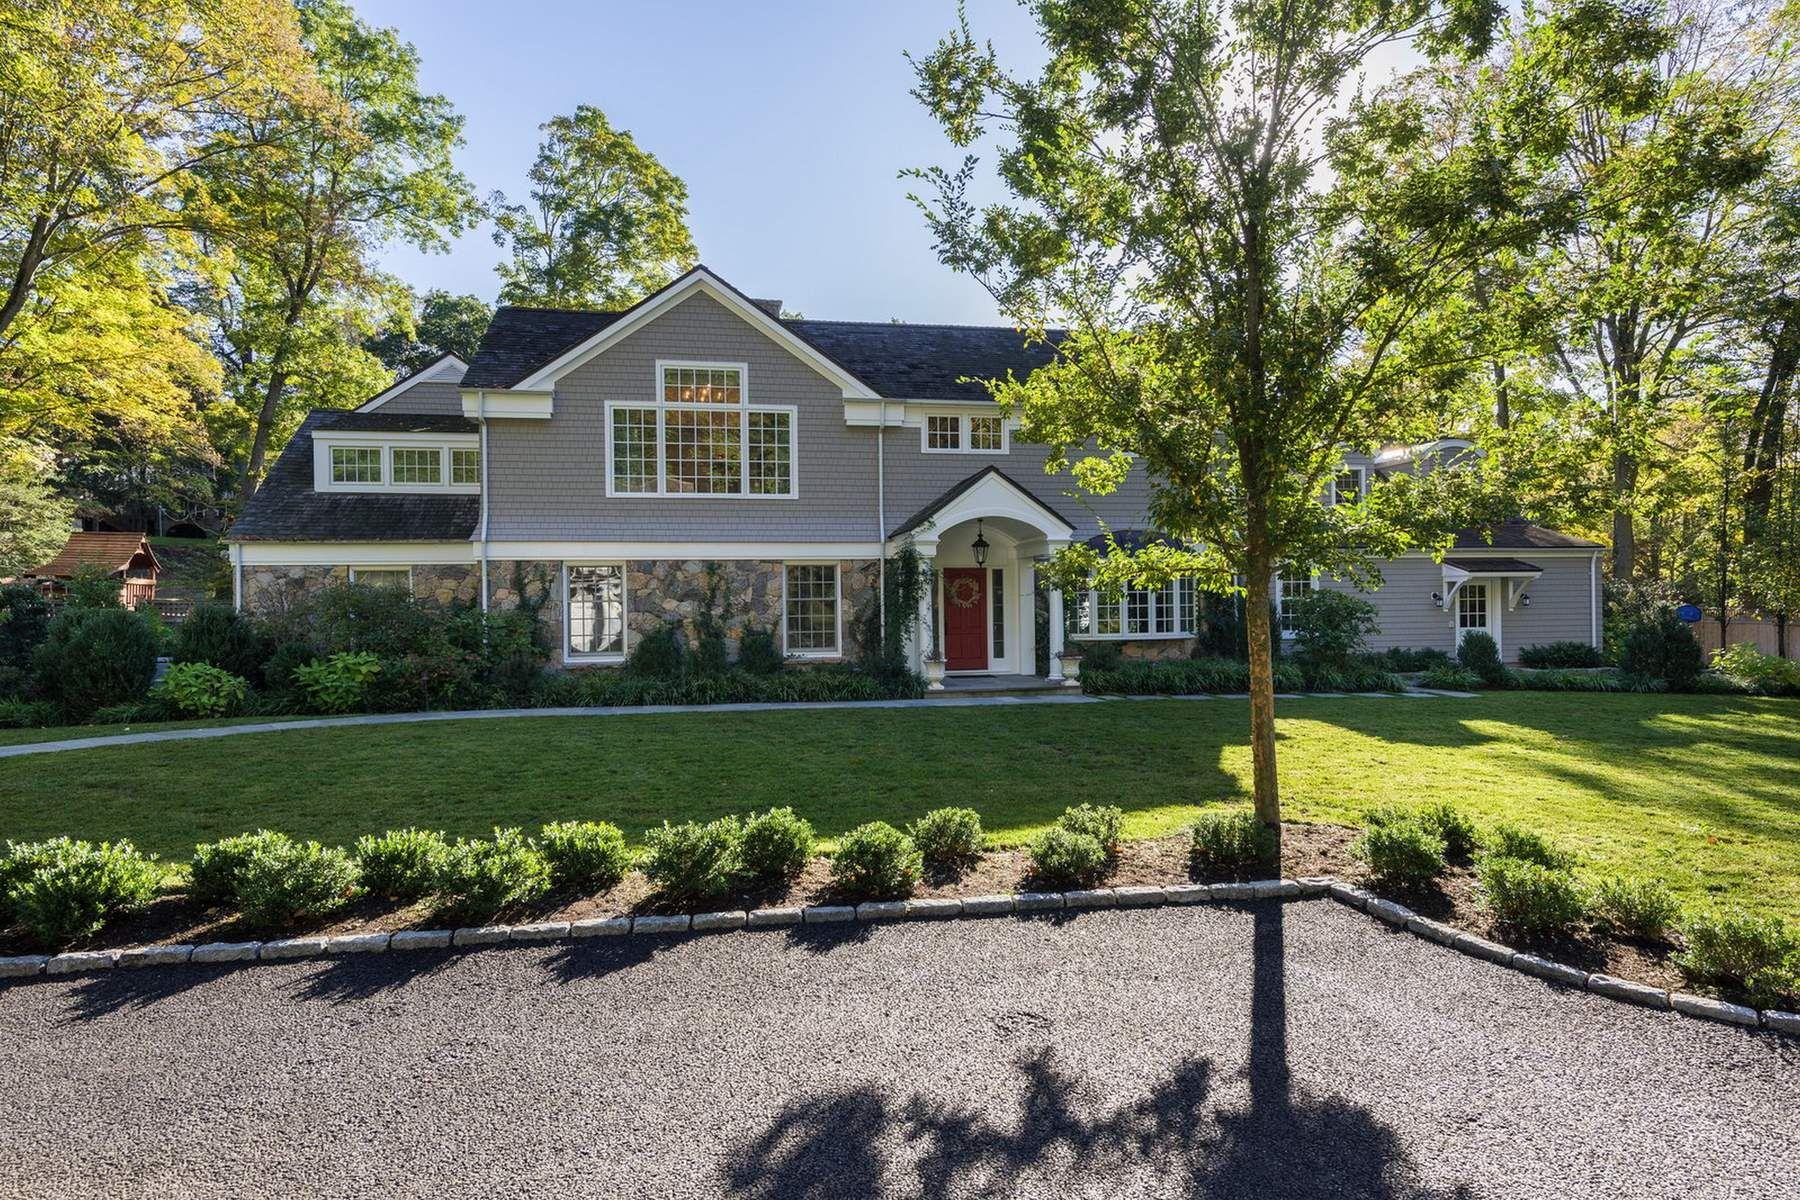 獨棟家庭住宅 為 出售 在 63 Burning Tree 63 Burning Tree Road, South Of Parkway, Greenwich, 康涅狄格州, 06830 美國